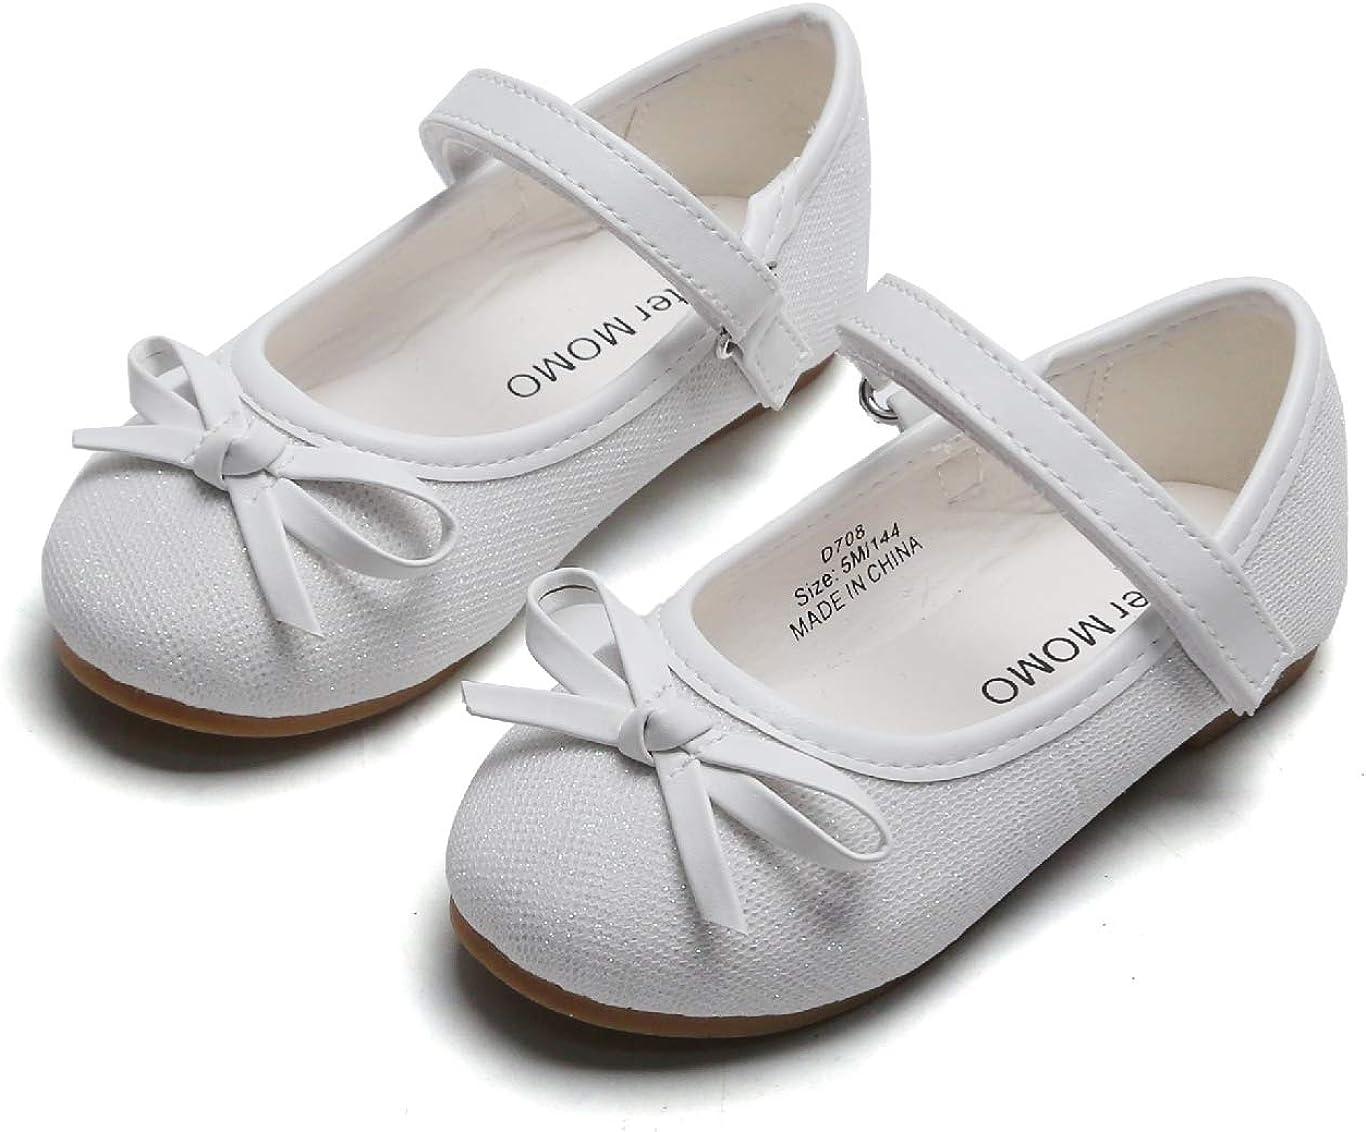 ESTINE Mary Jane Flats for Little Kids Toddler Baby Girls Glittery Dress Princess Ballet Shoes